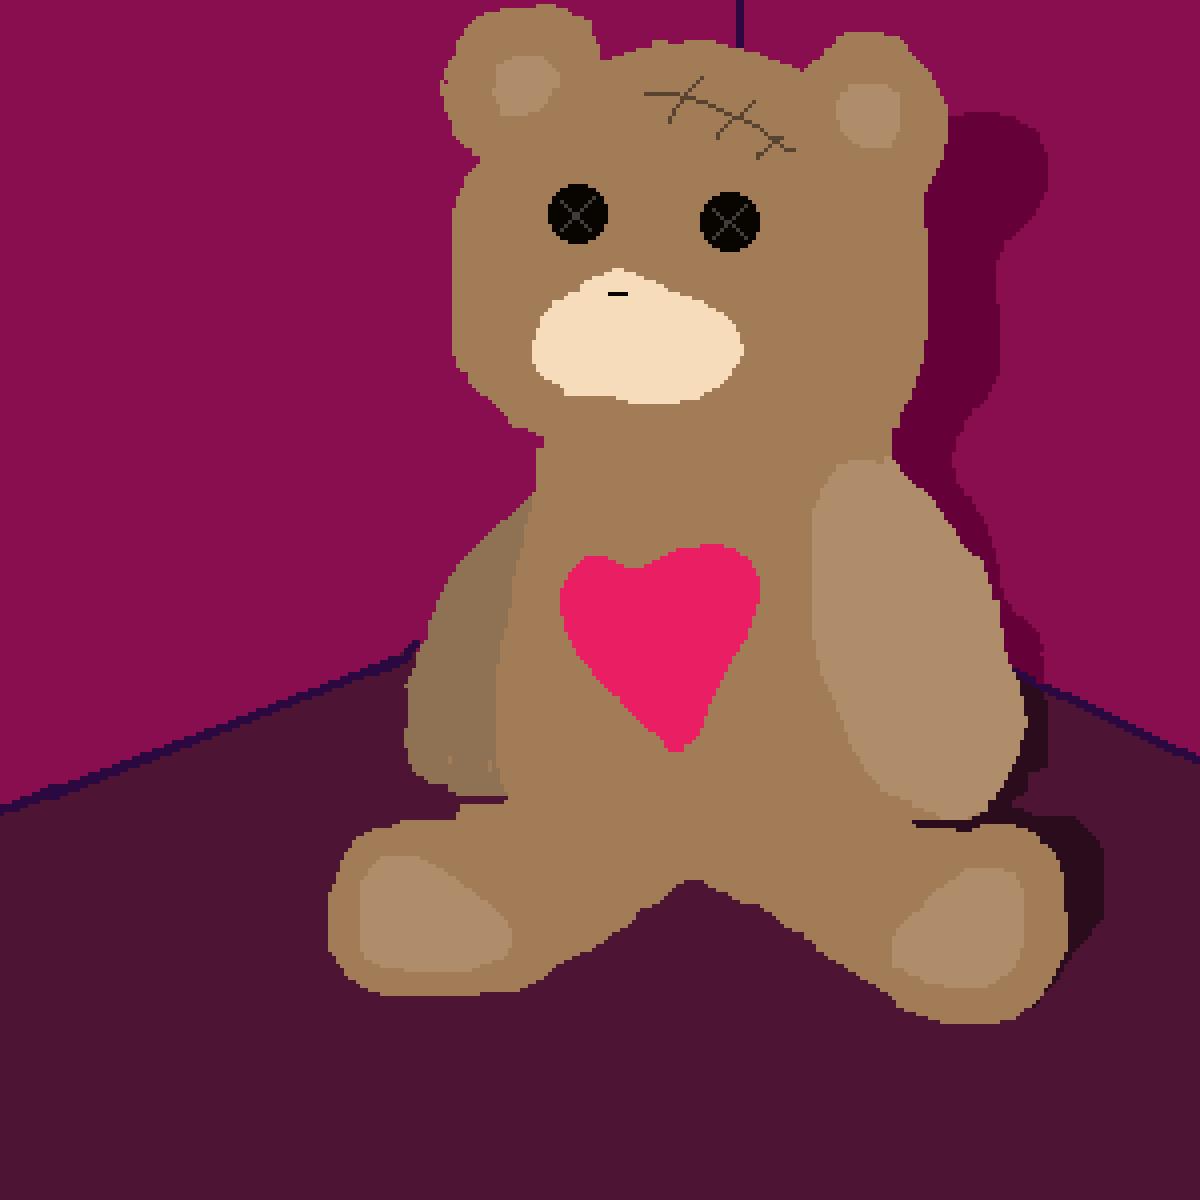 Happy Valentine's Day by Pewpewpanda